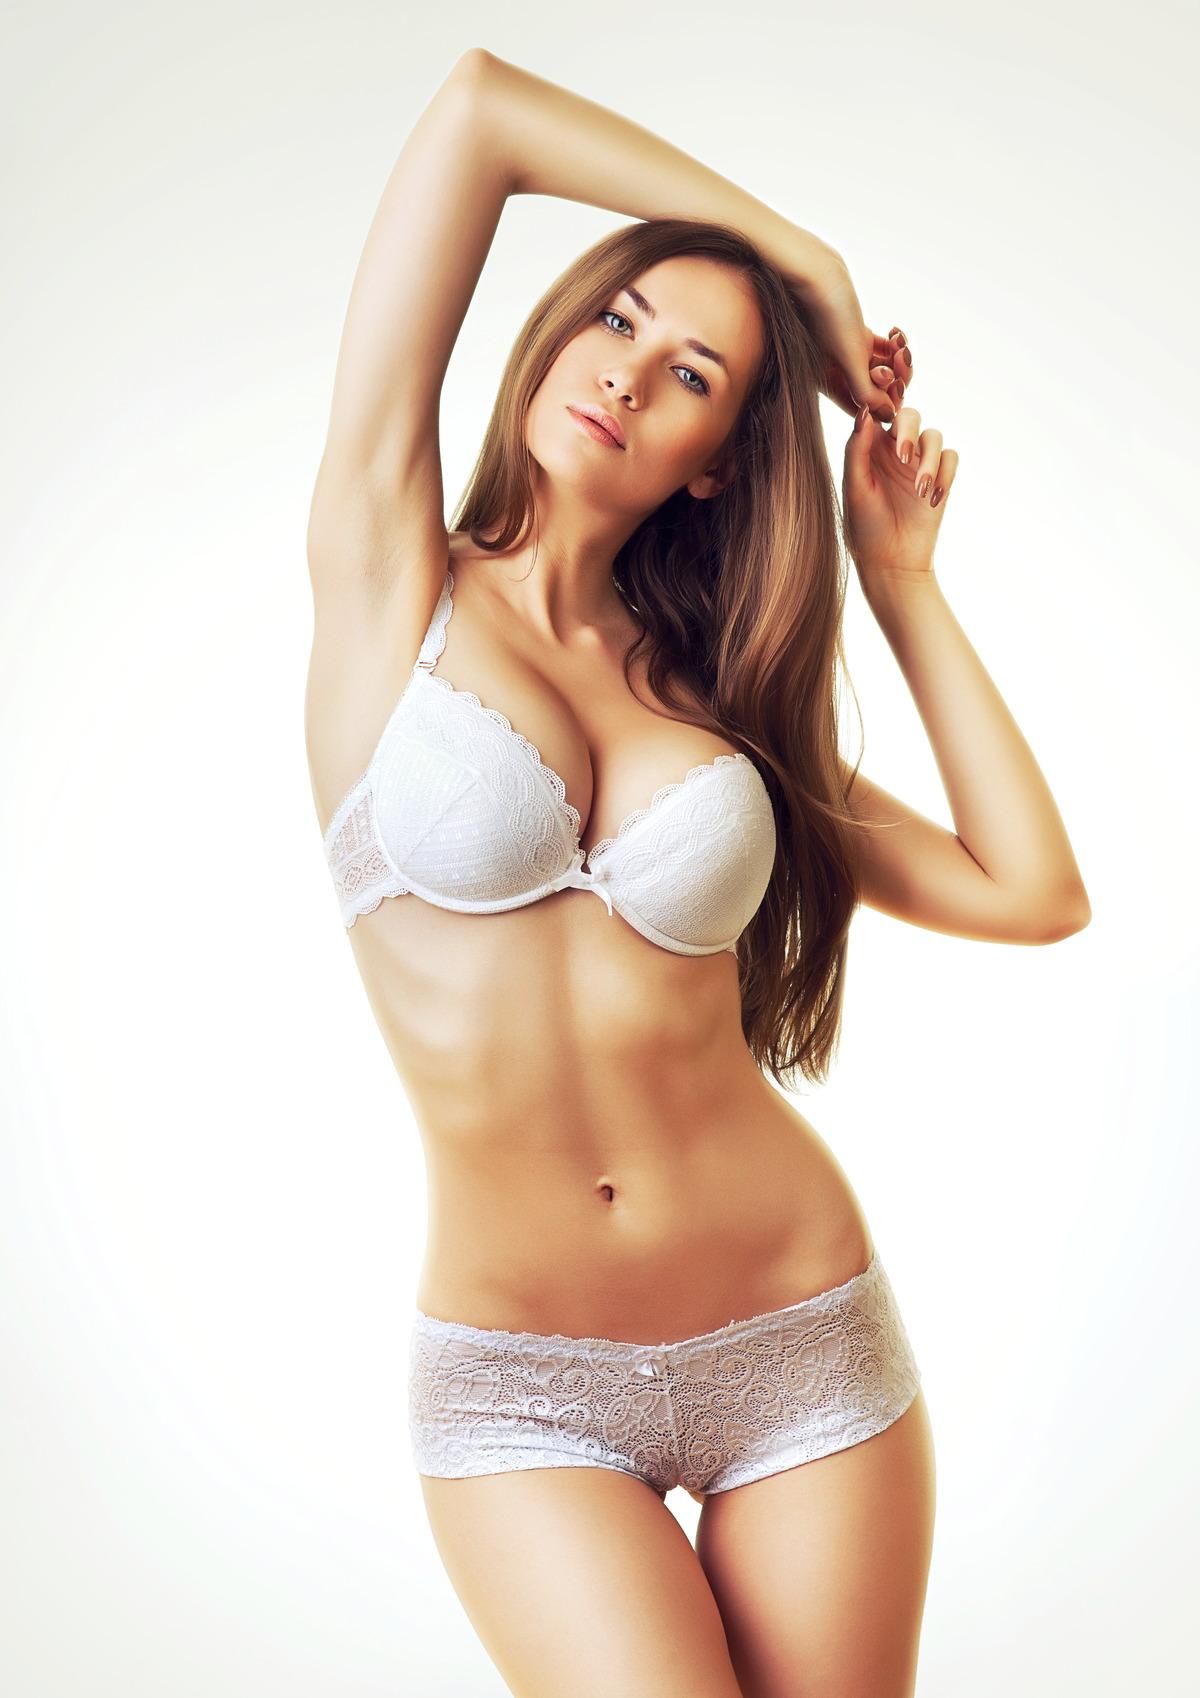 Sexy sportliches Girl